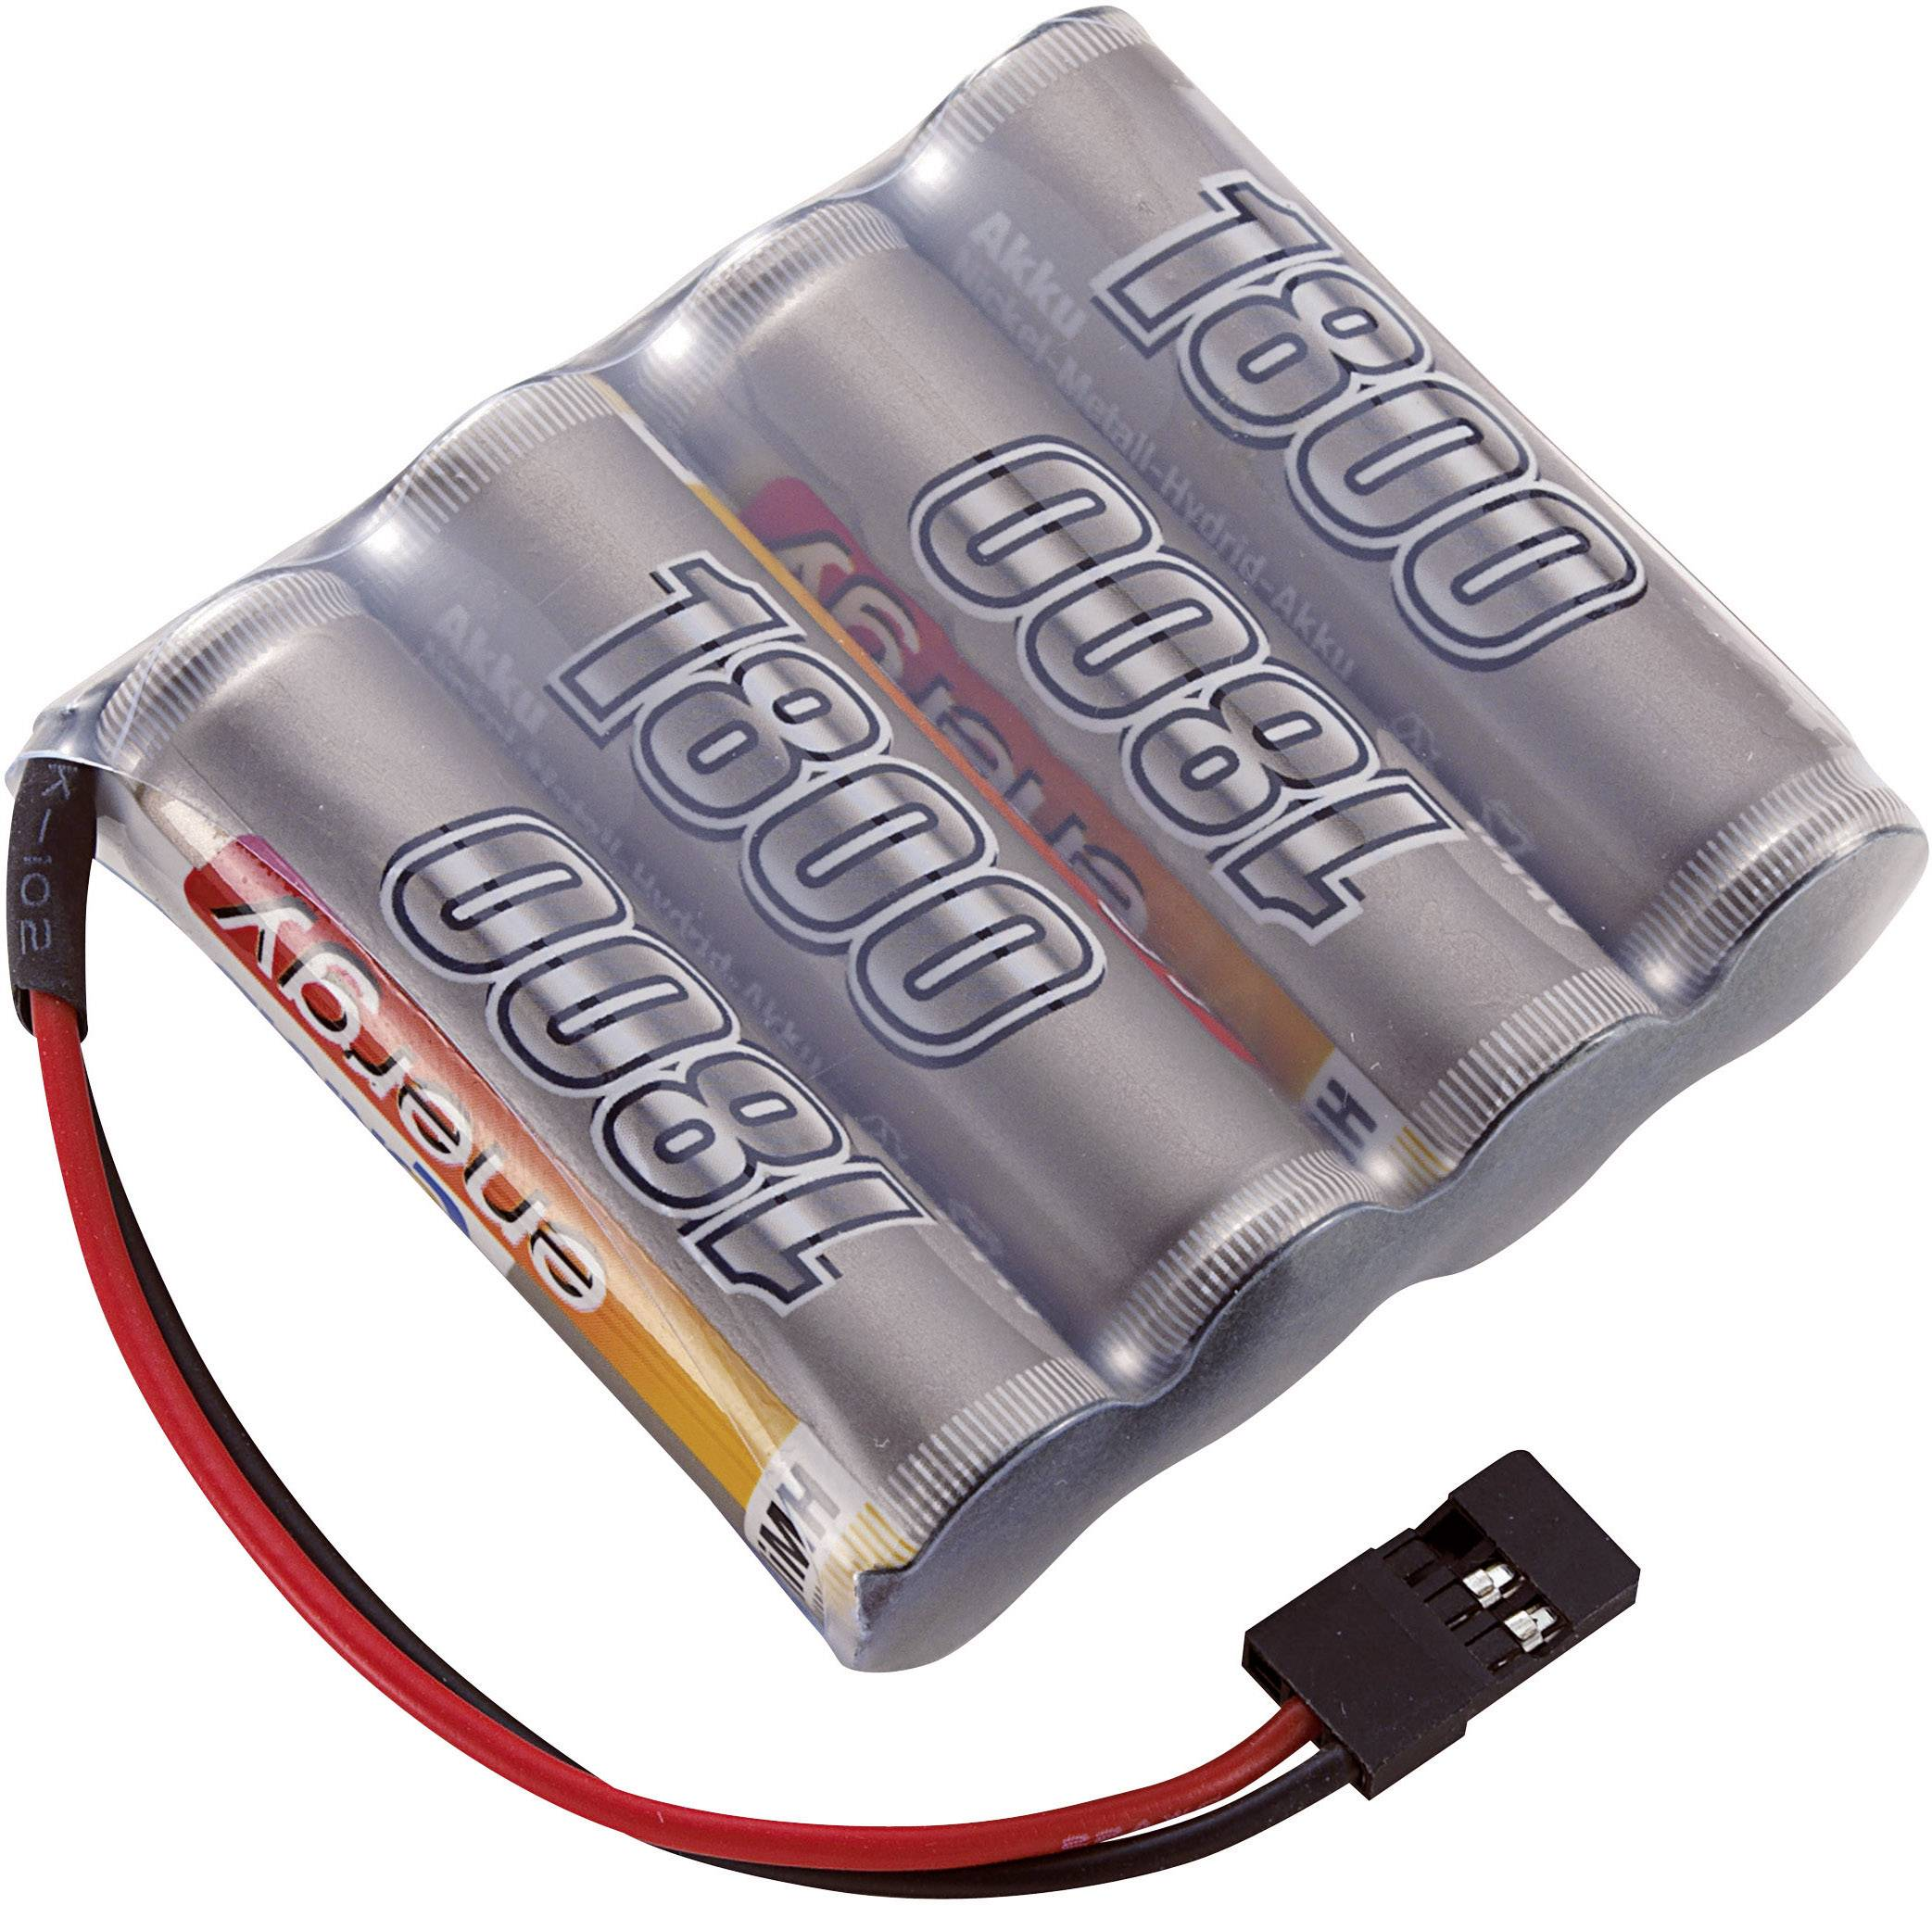 Akupack přijímače NiMH Conrad Energy AA, 4,8 V, 1800 mAh, Side by Side, JR